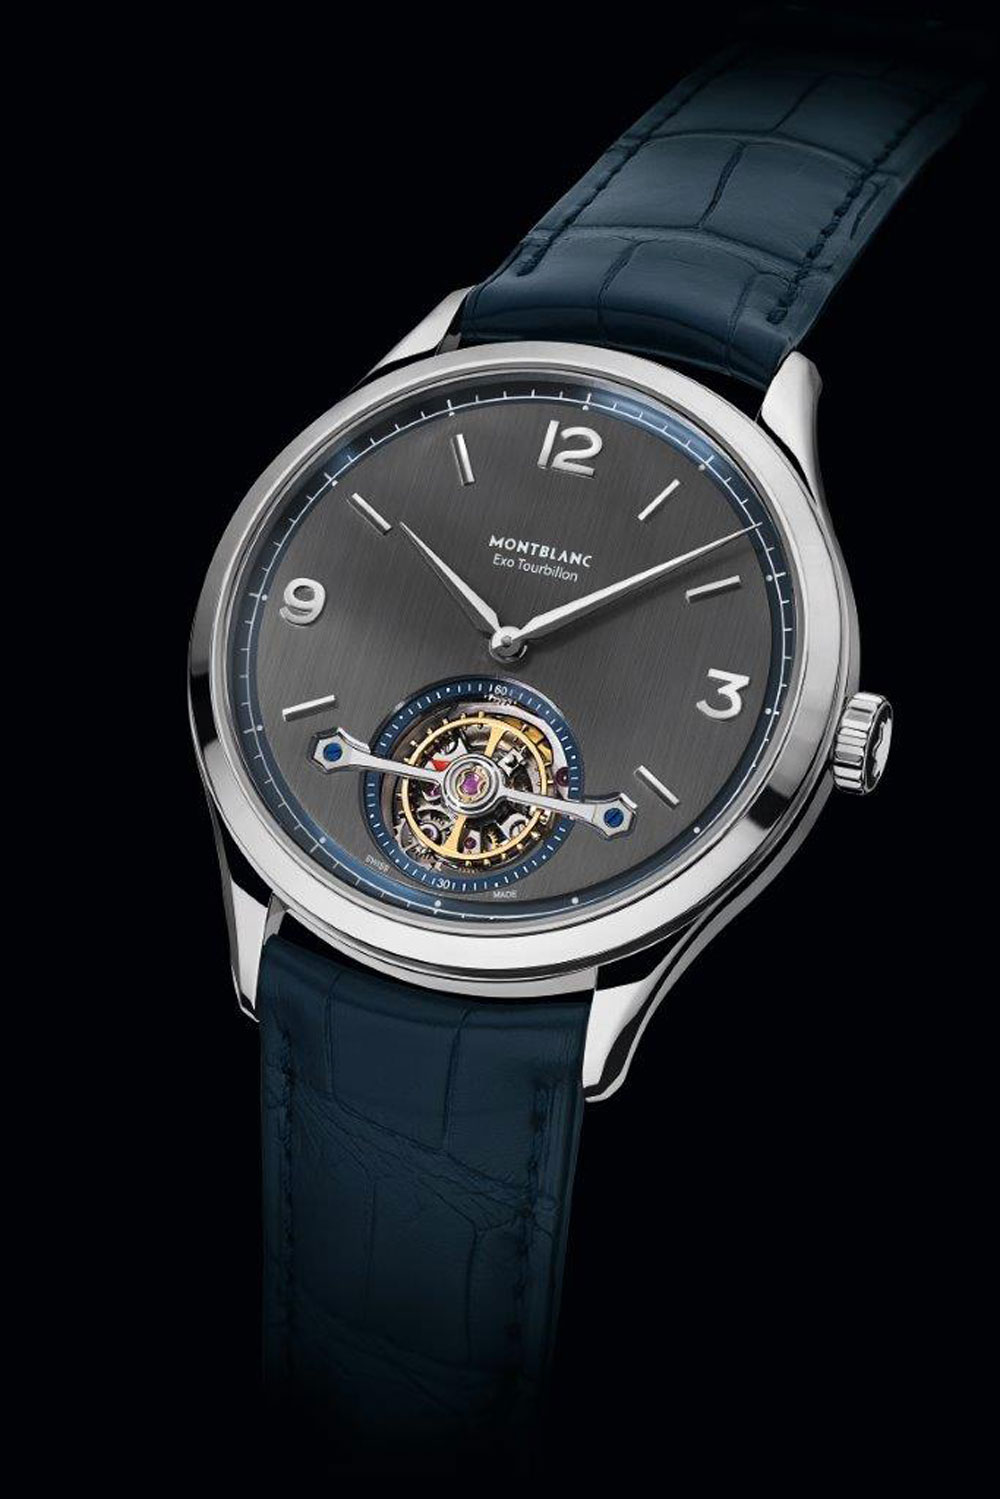 Reloj plano con tourbillon Heritage Chronométrie Exo Tourbillon Slim de Montblanc